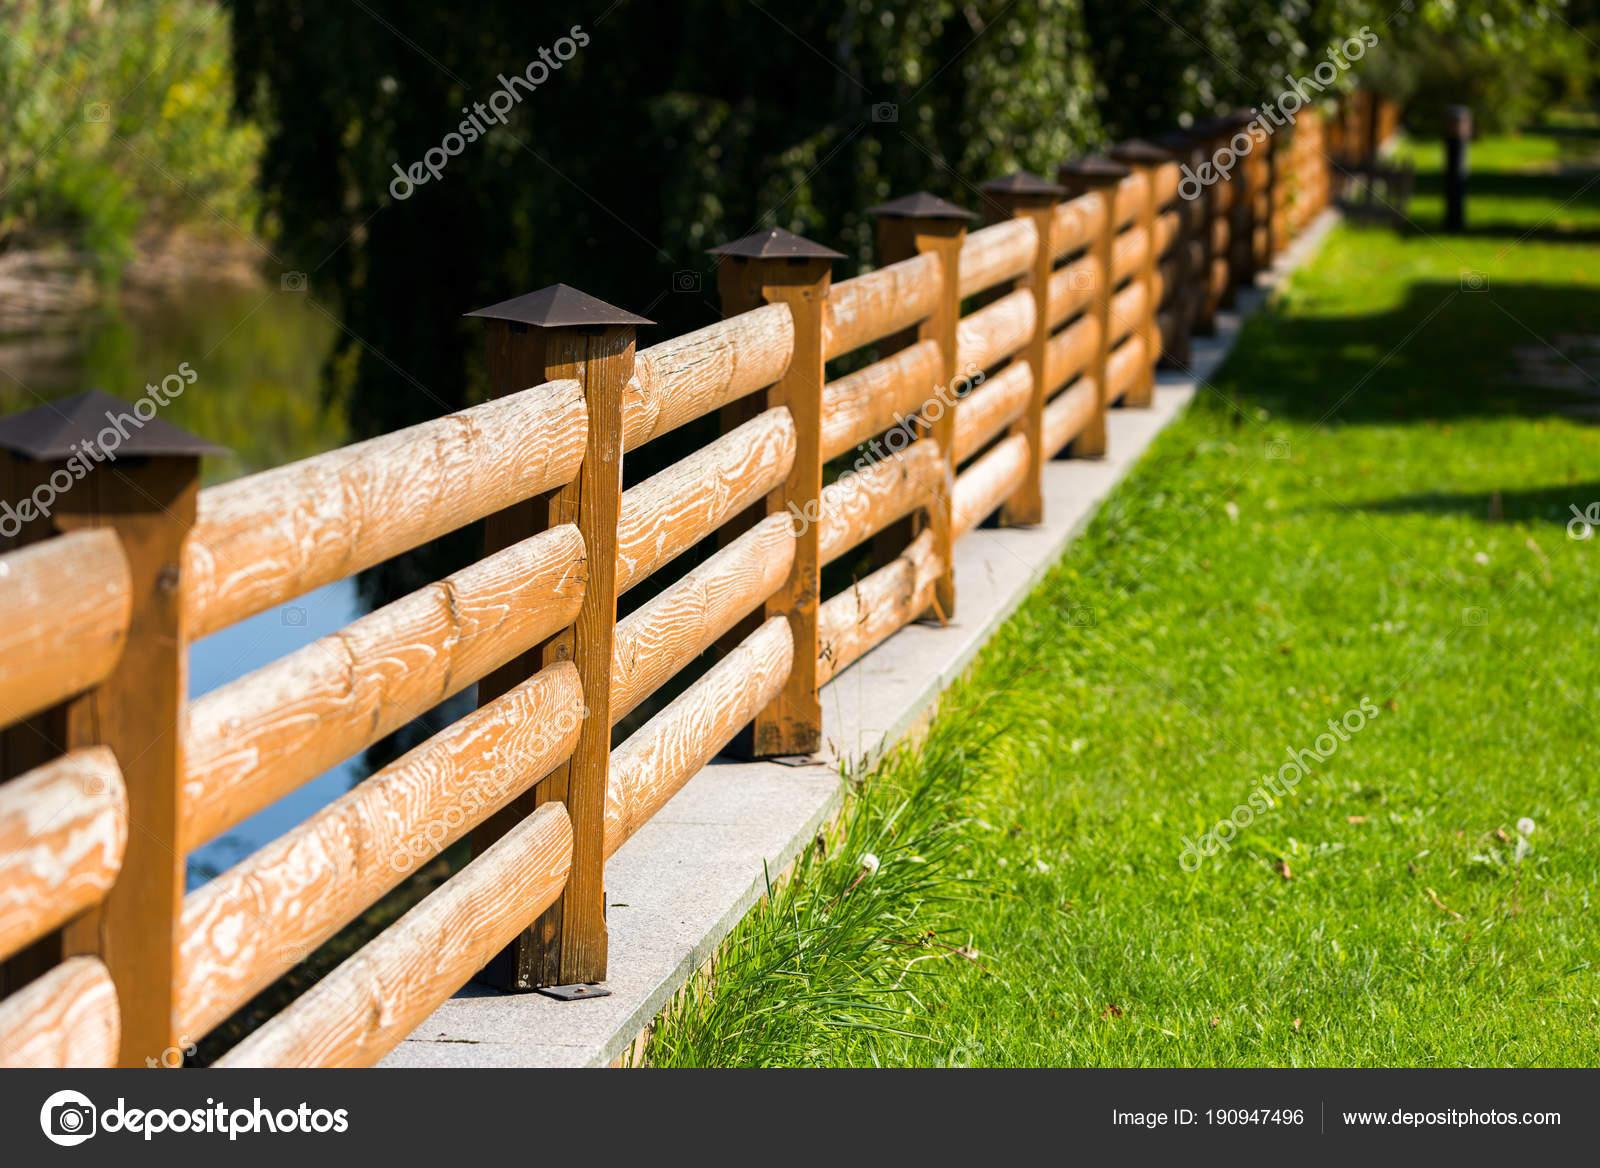 Calle valla de madera de tablones marco horizontal foto - Valla de madera ...